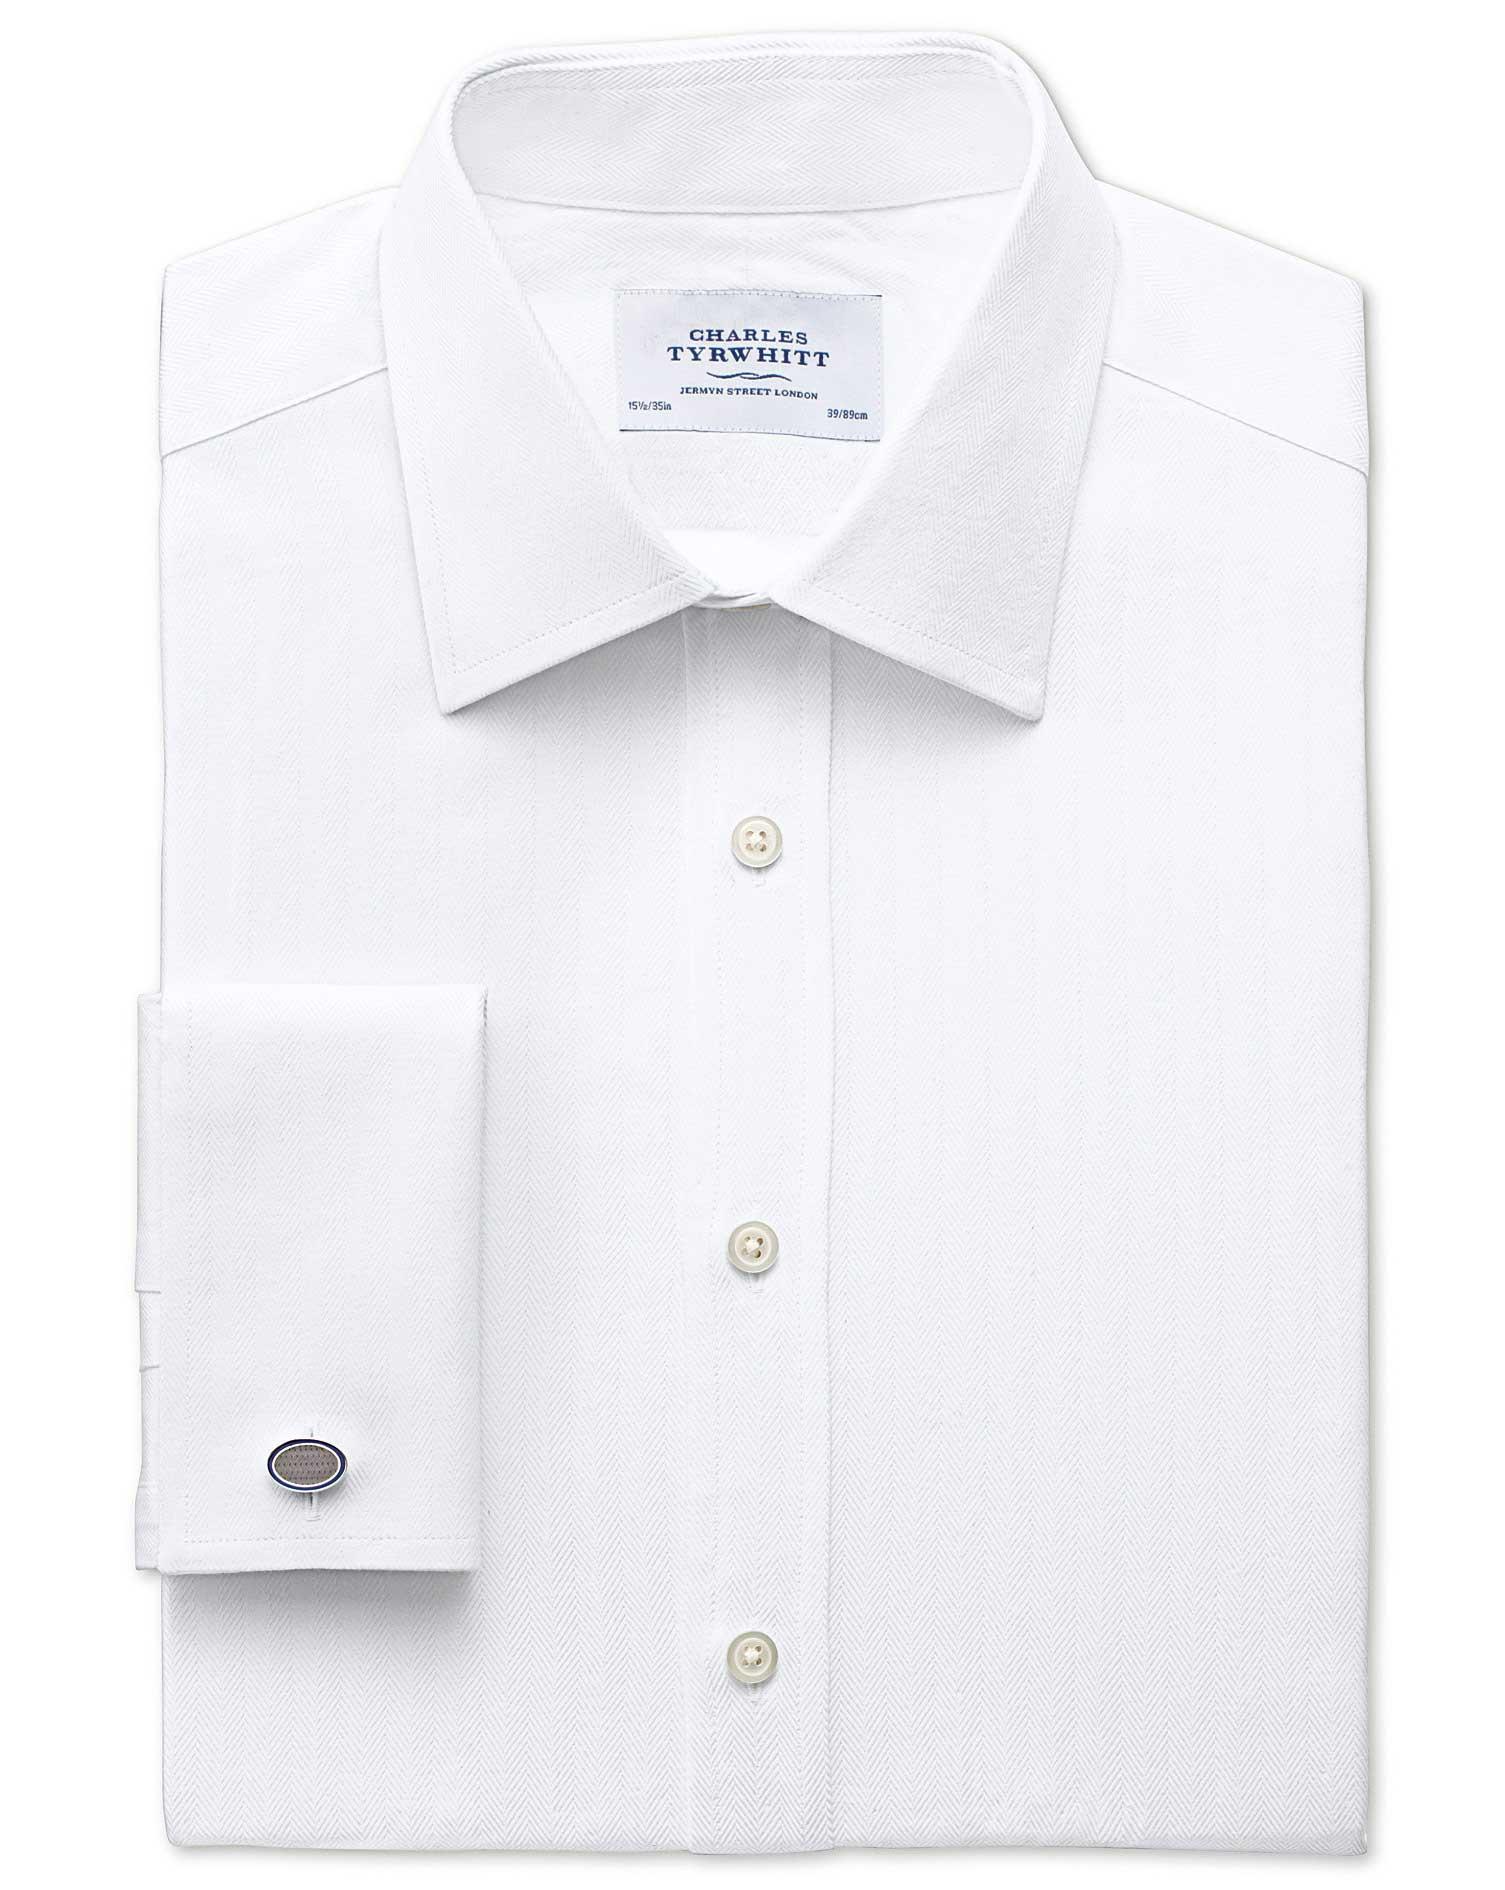 Classic Fit Pima Cotton Herringbone White Formal Shirt Single Cuff Size 16/38 by Charles Tyrwhitt